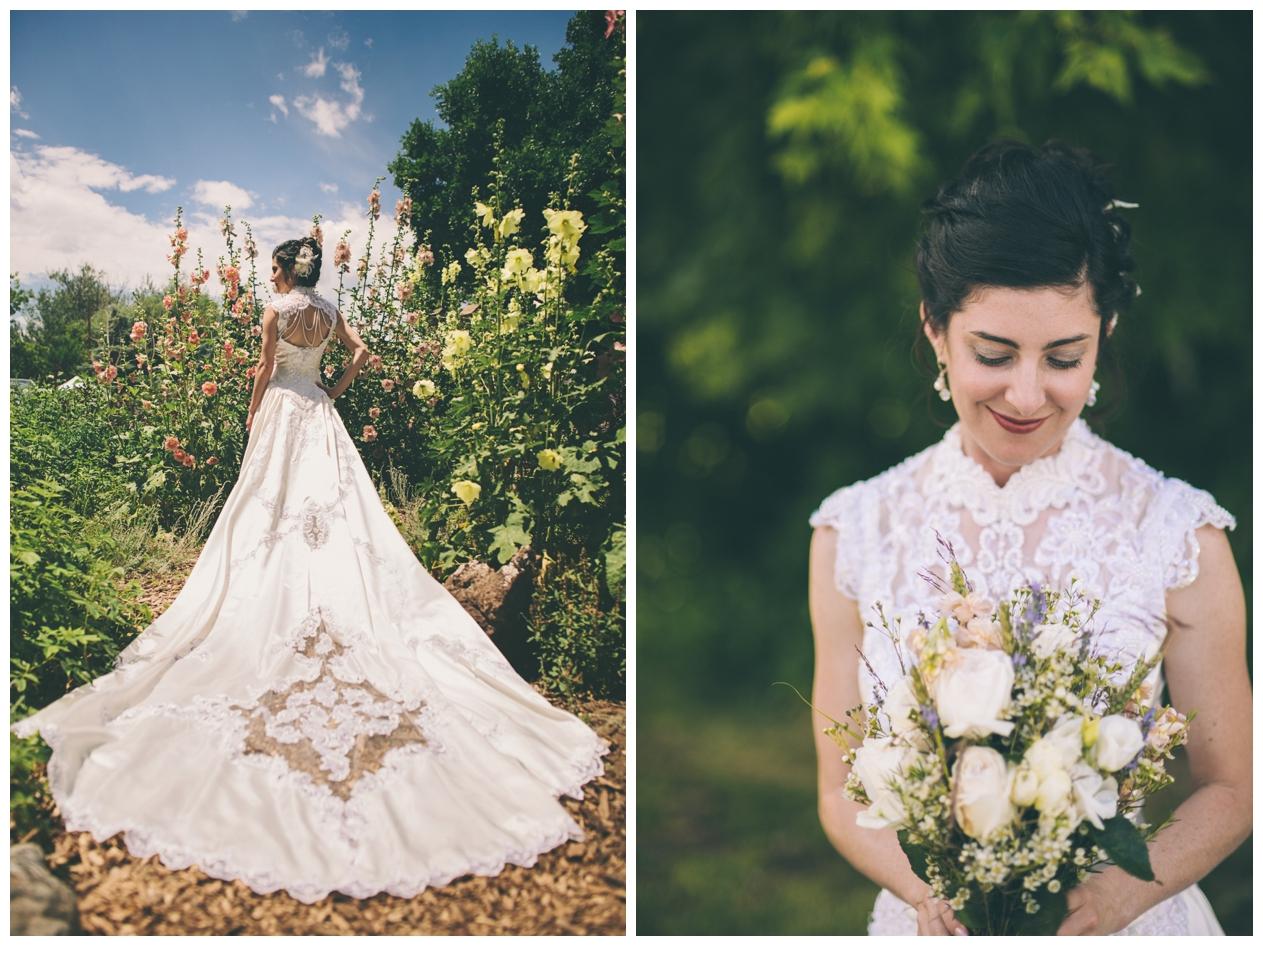 011-AmandaKoppImages-Colorado-Farm-Wedding-Photo.jpg